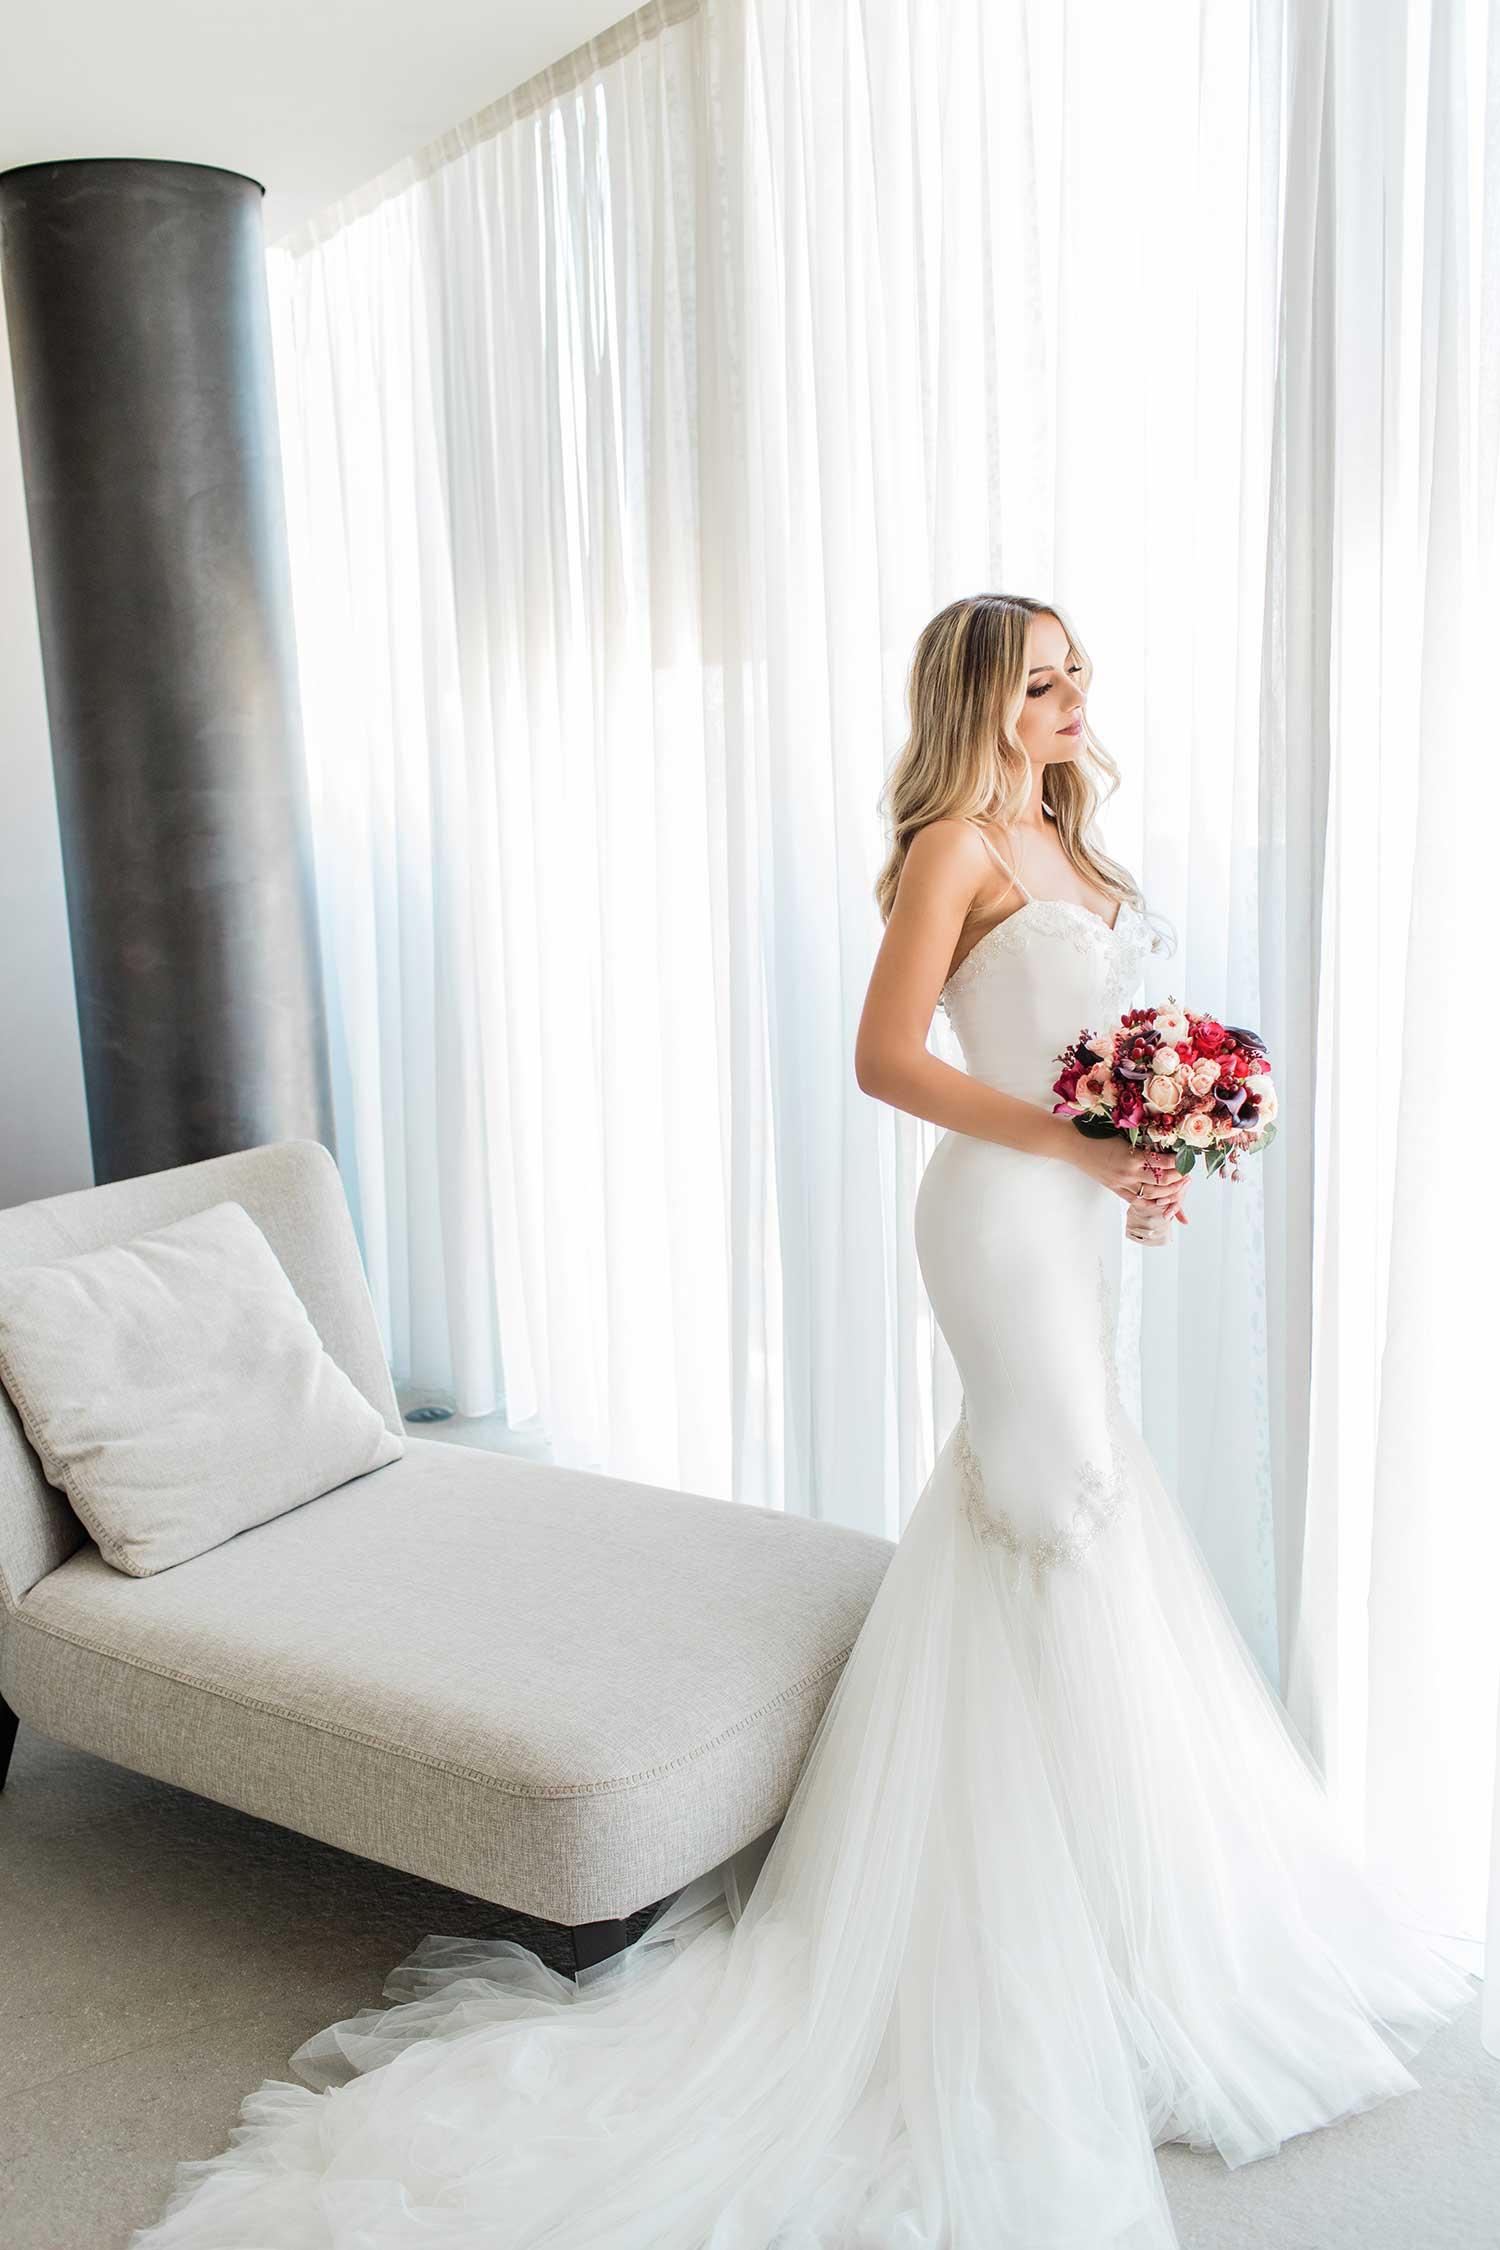 Gorgeous bride wearing white wedding dress